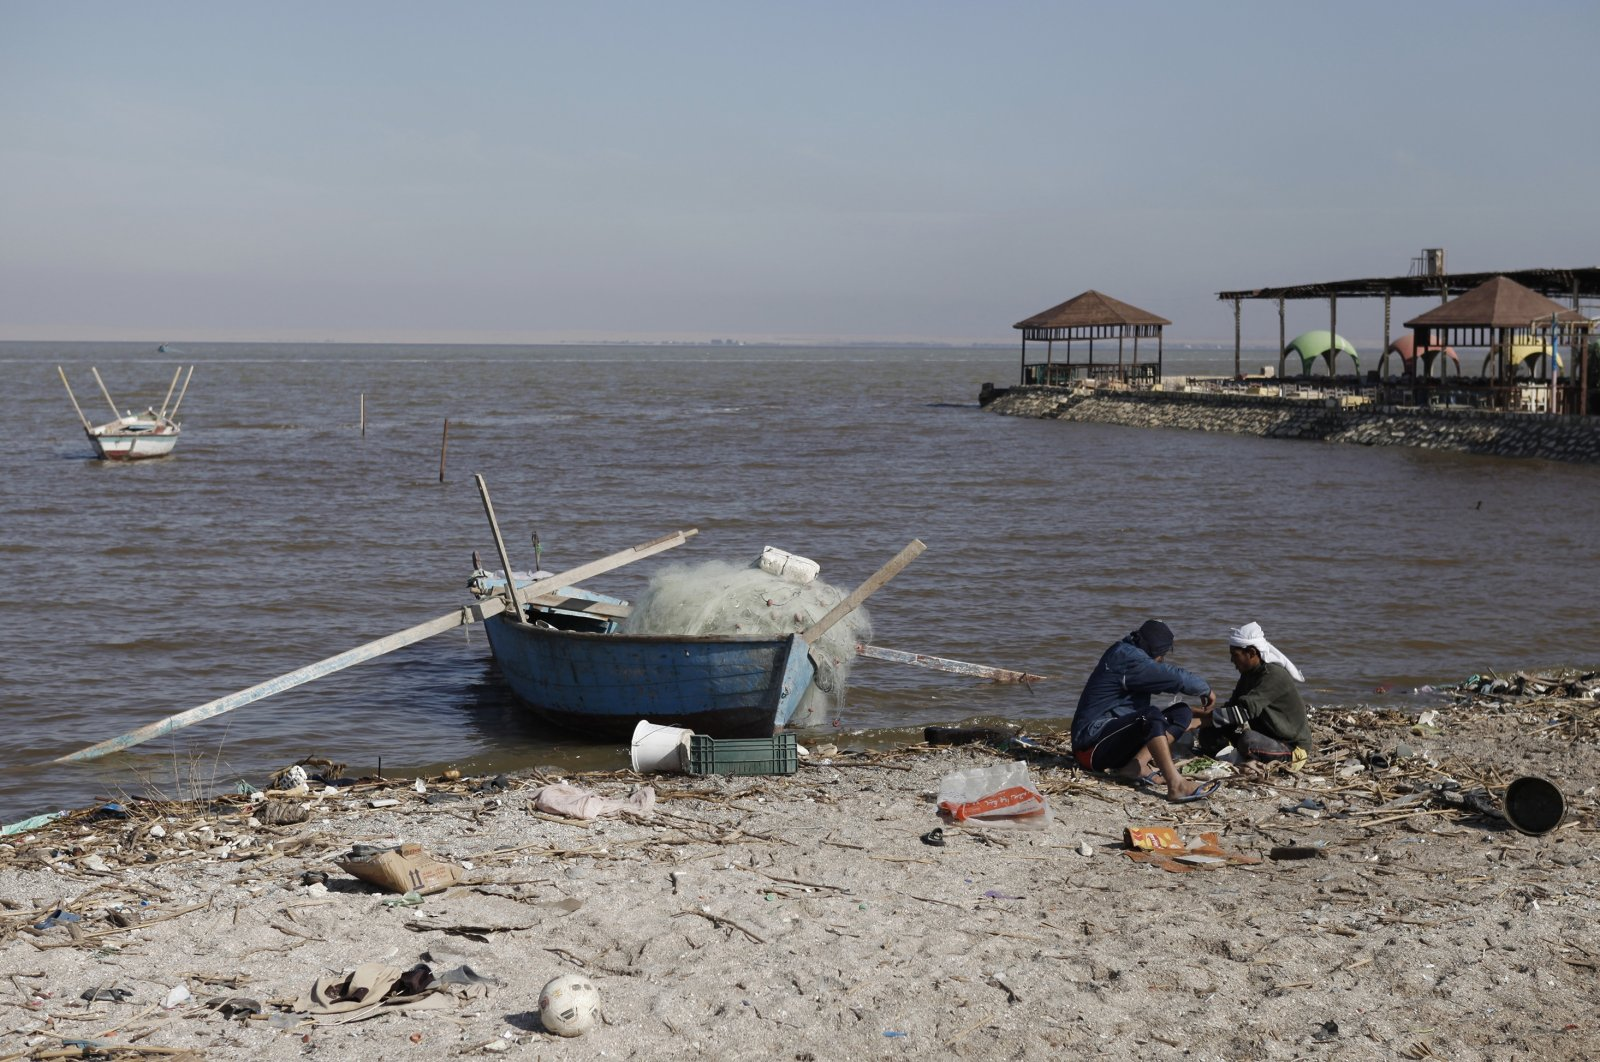 Egyptian fishermen sit by a small fishing boat on Lake Qaroun in Fayoum, Egypt, Jan. 15, 2014. (Getty Images)